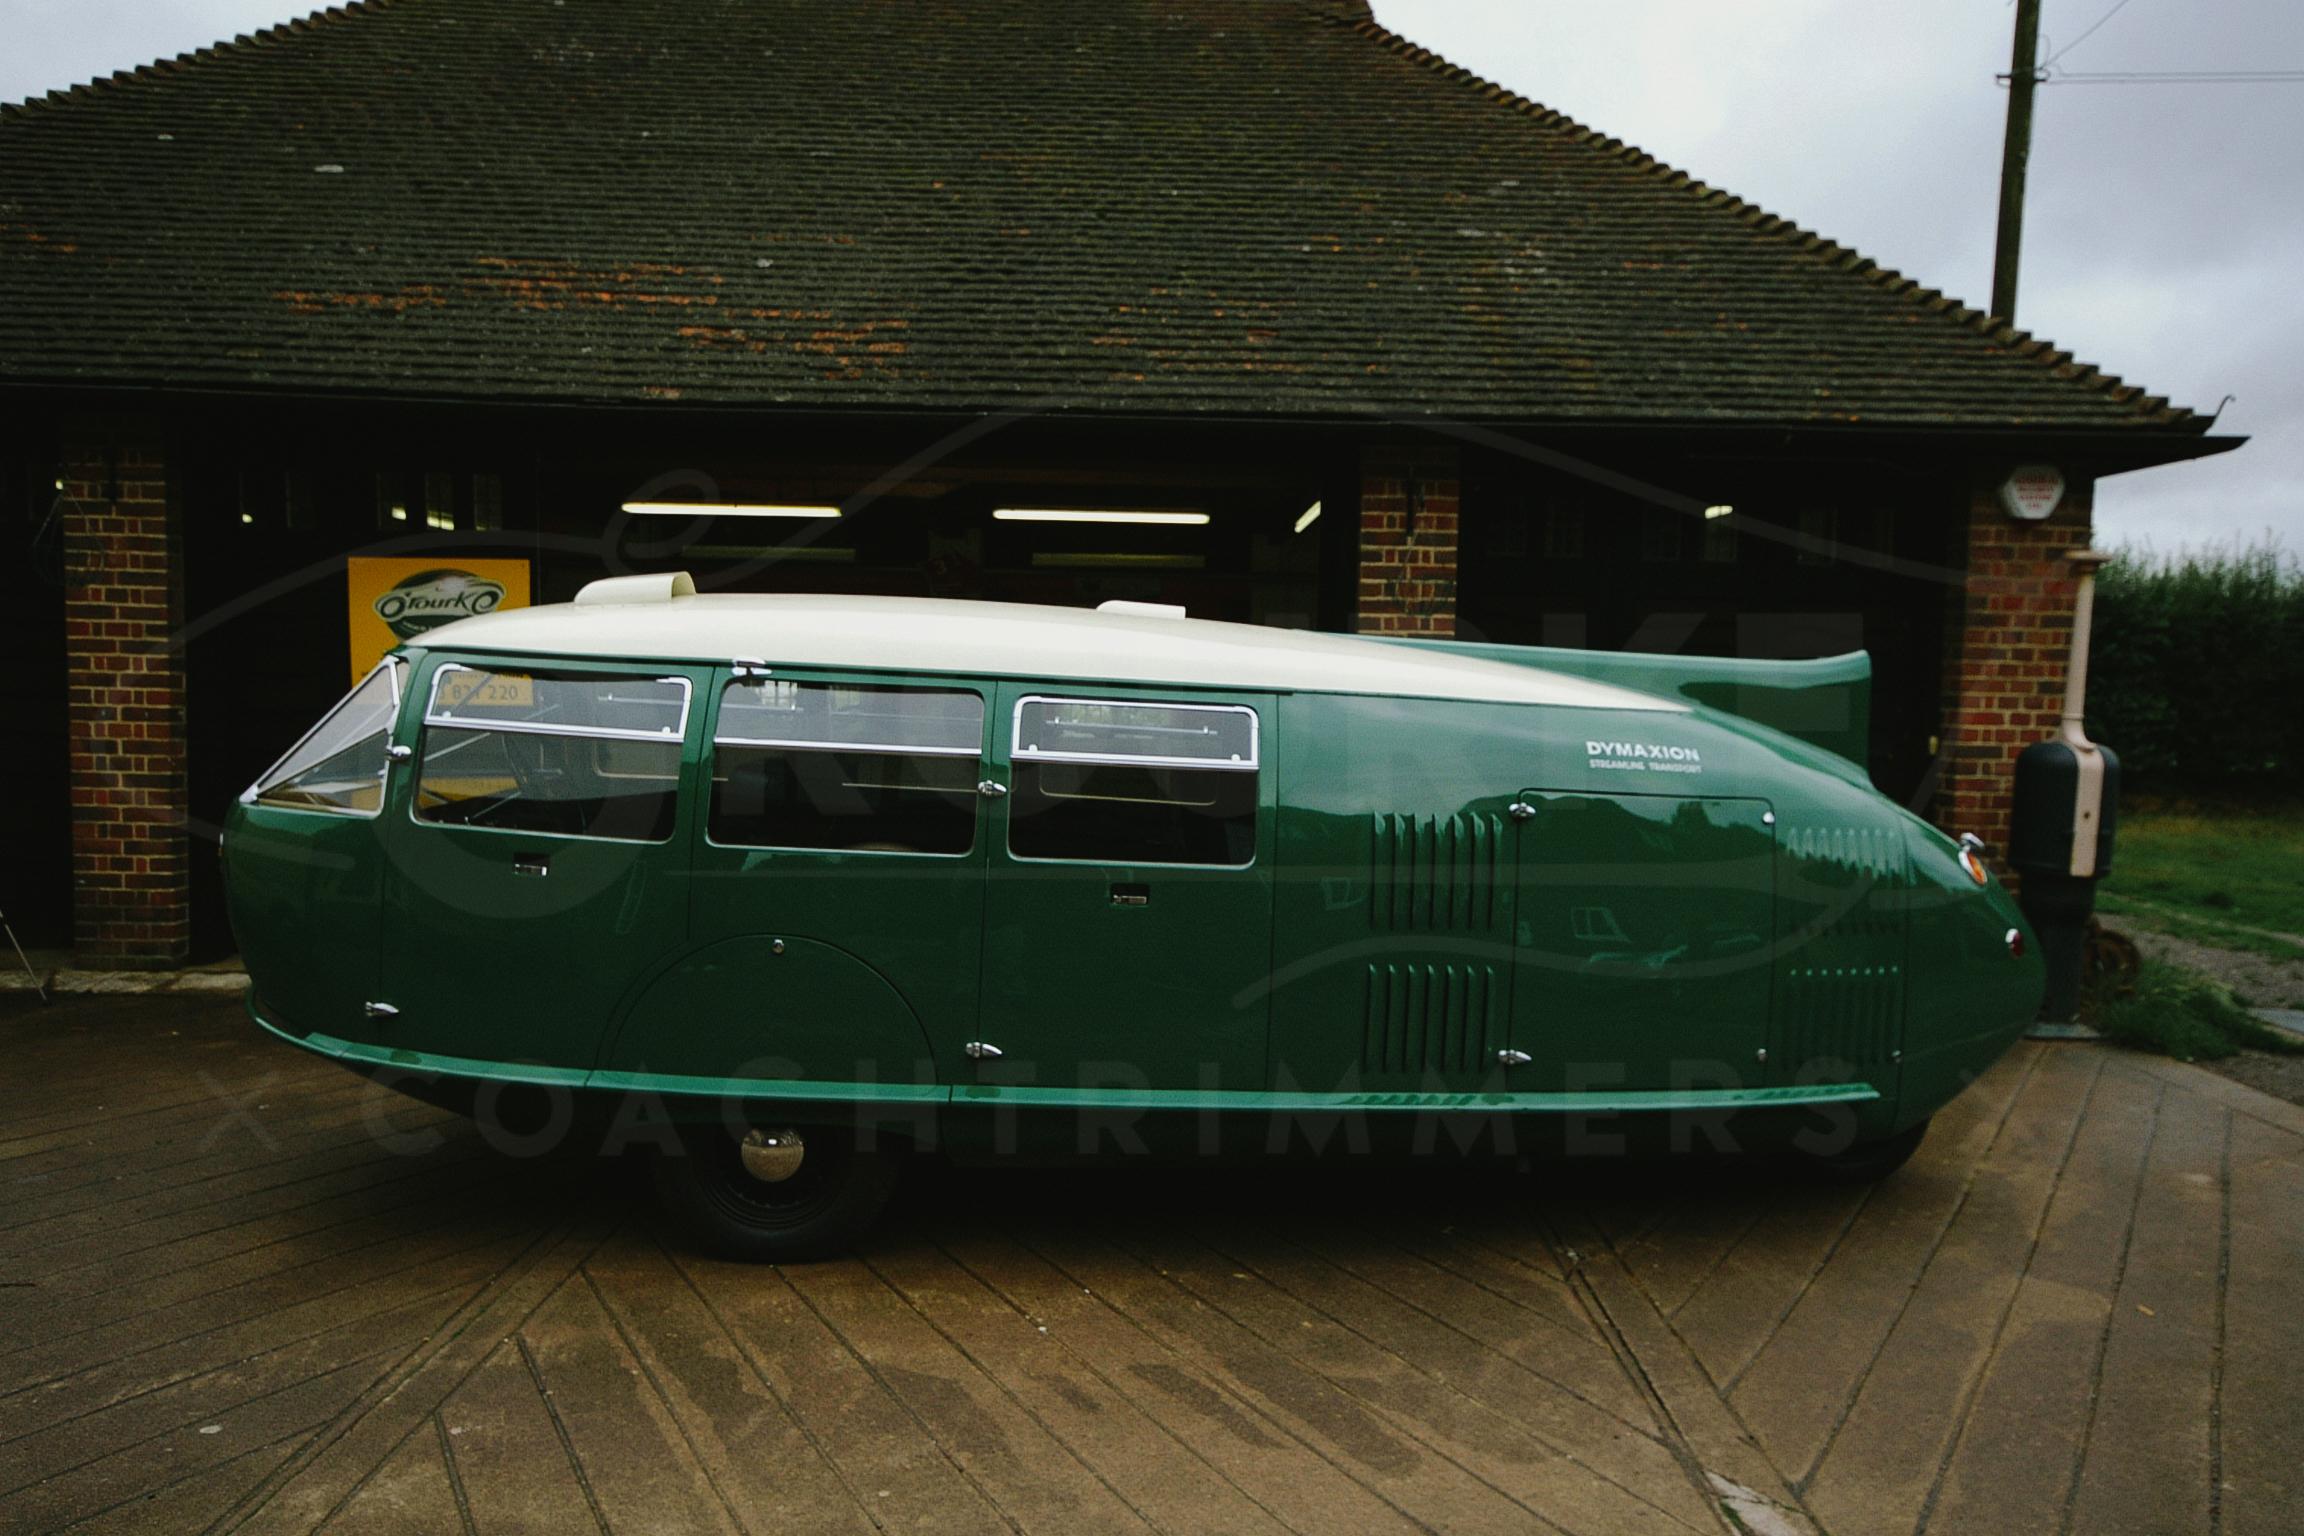 o-rourke-coachtrimmers-dymaxion-car-3-4.jpg